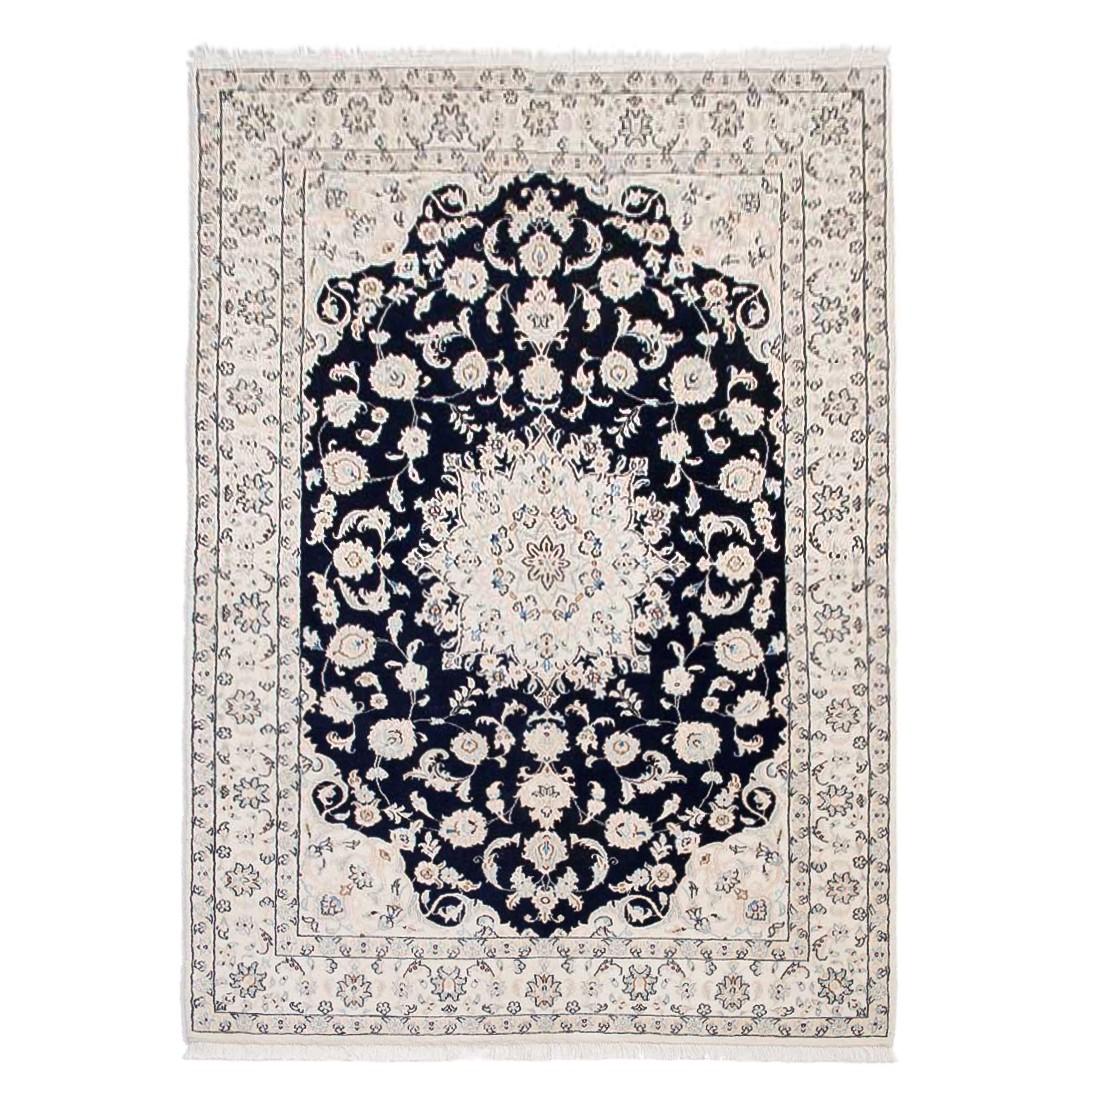 Tapijt Nain Scherkat Royal - blauw 100% scheerwol 120x200cm, Parwis